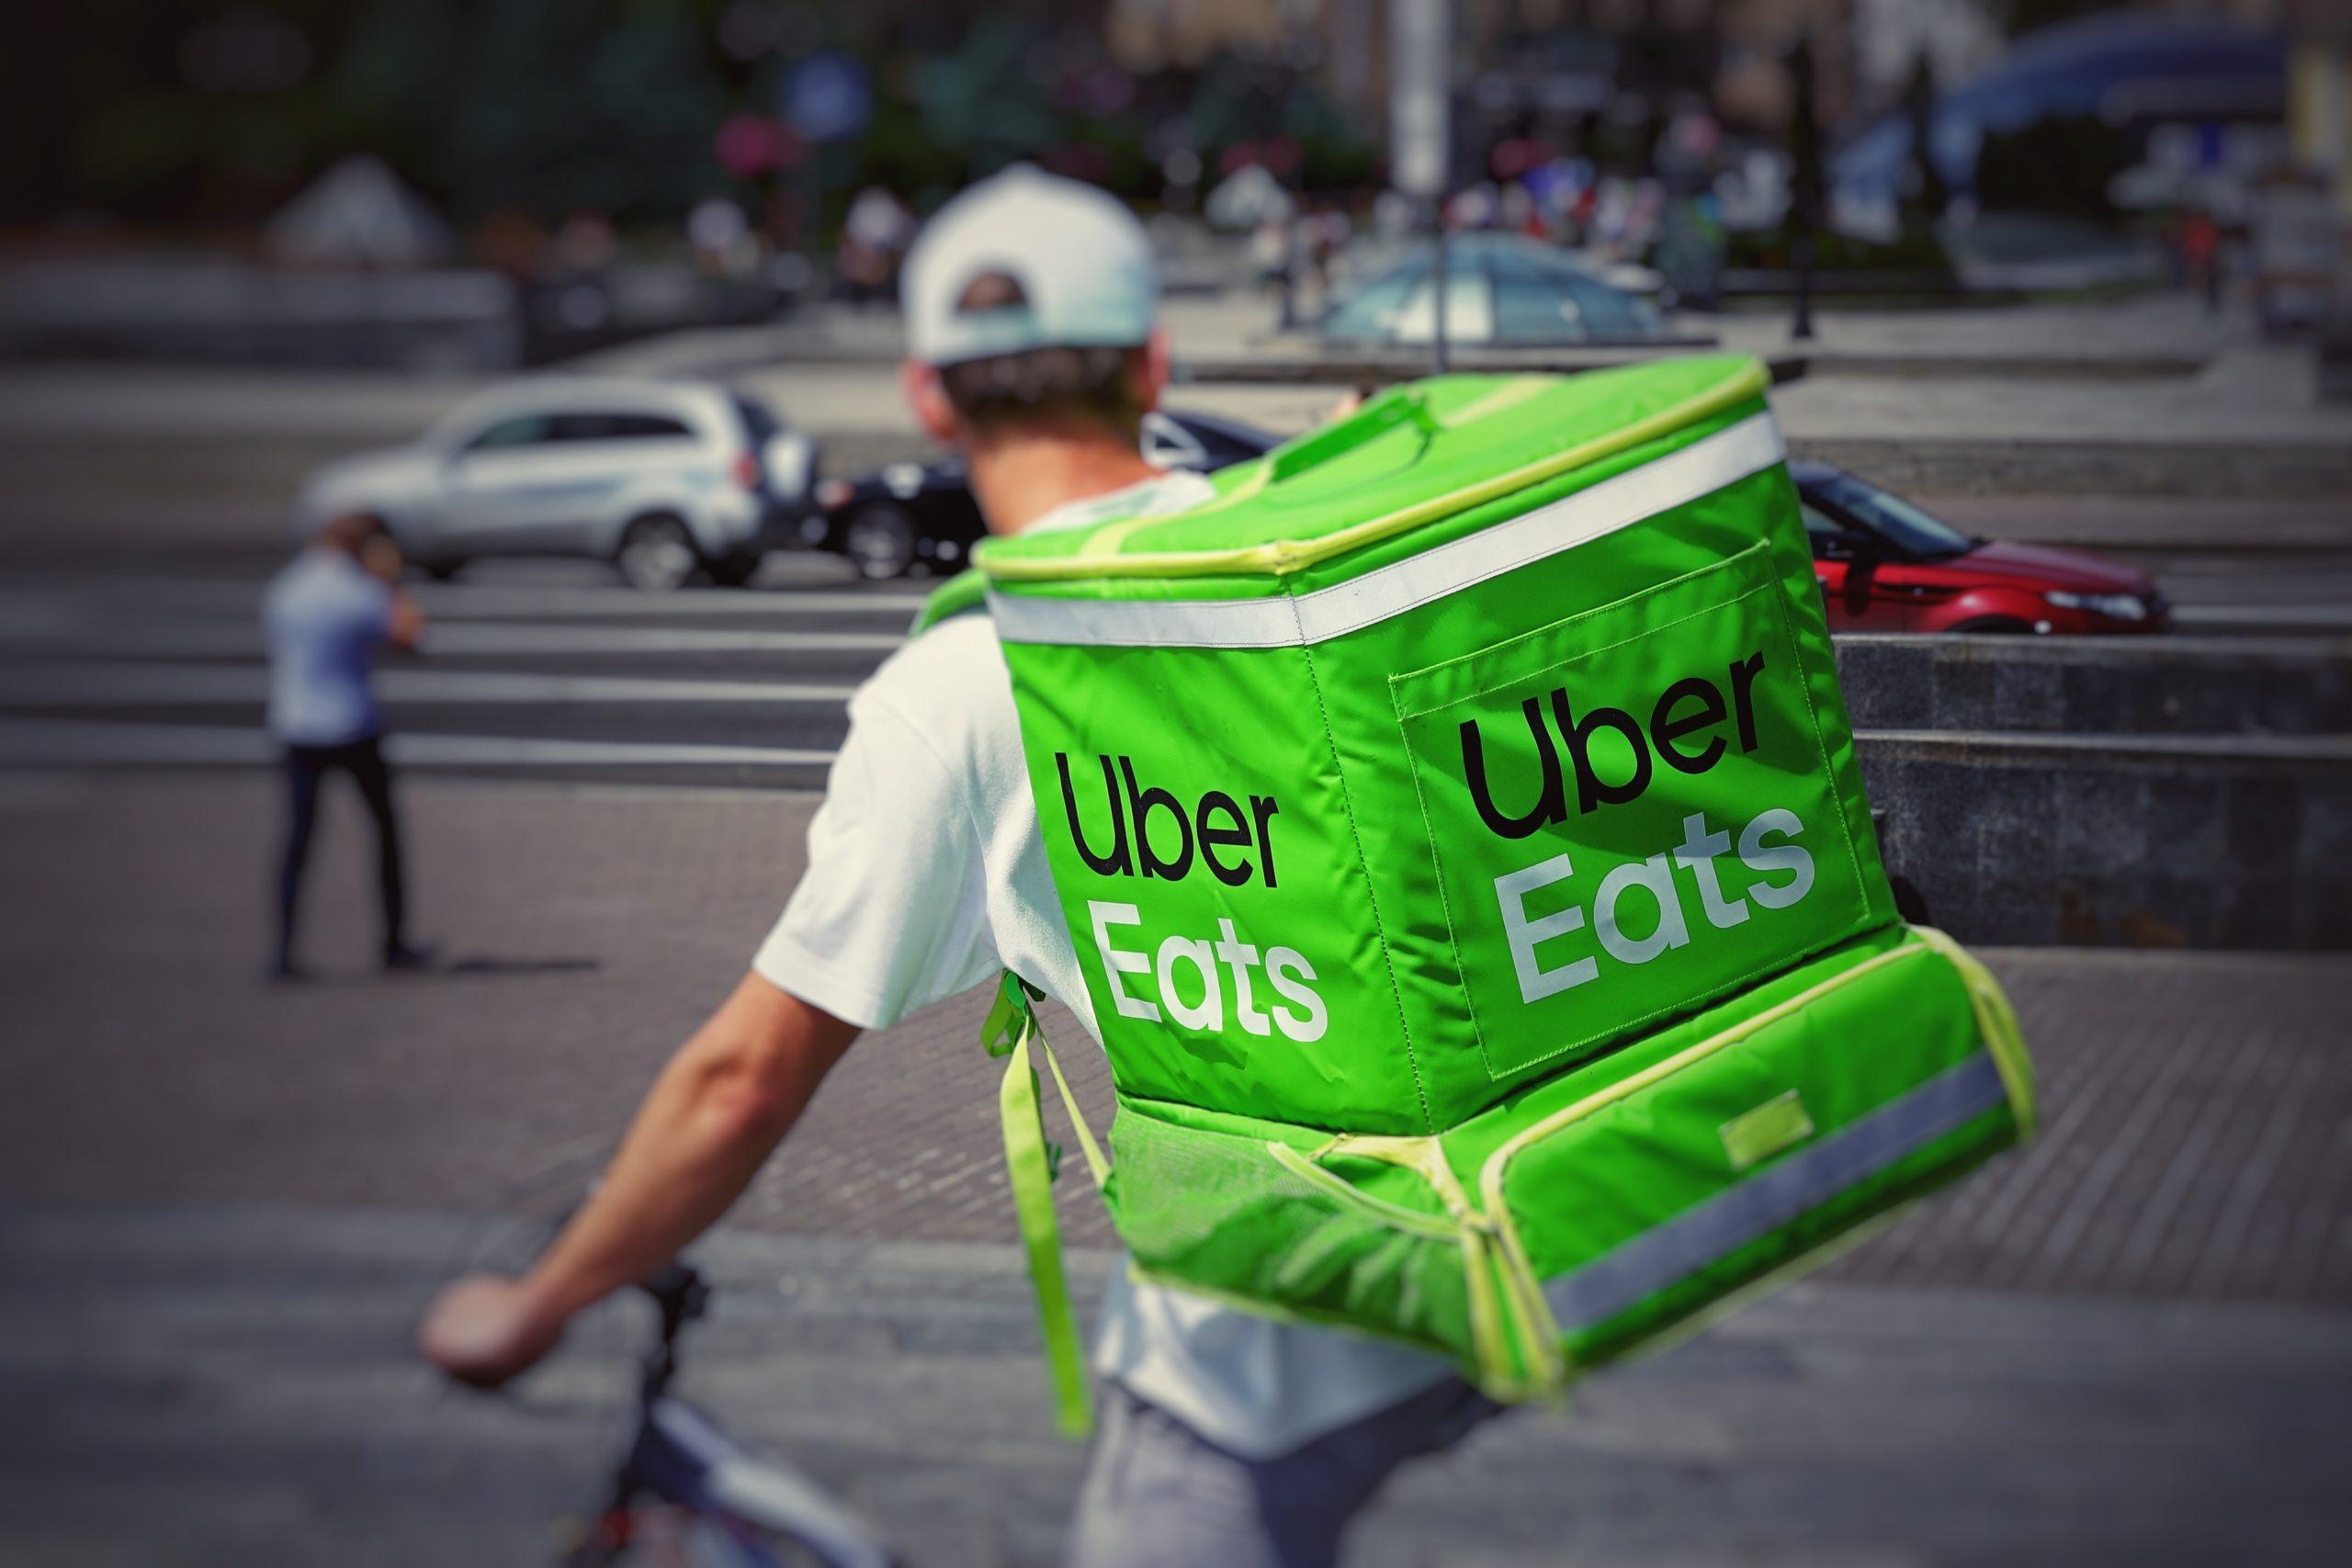 Uber Eats(ウーバーイーツ)は札幌市でいつから利用できるアカウント登録や利用方法は?